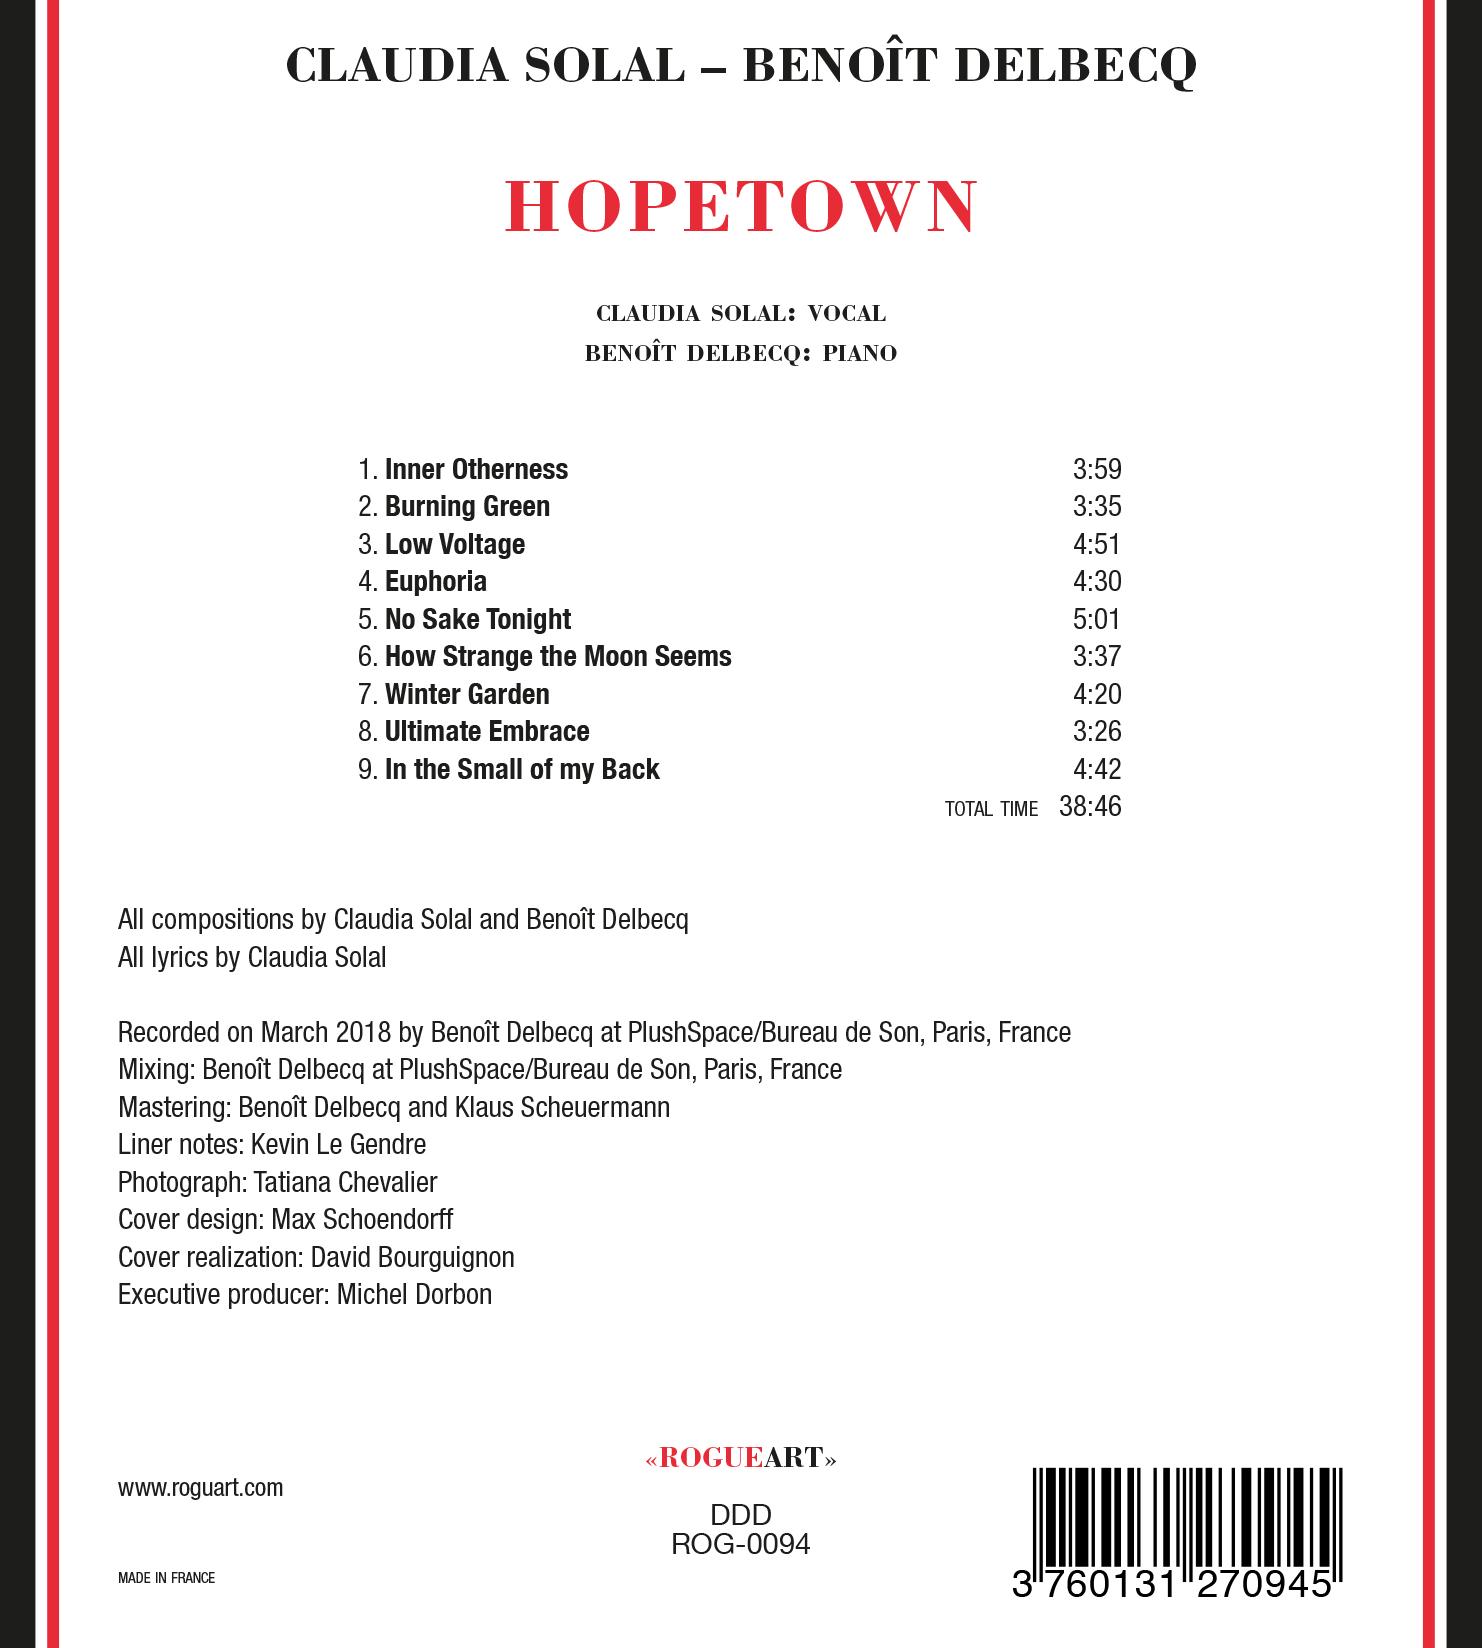 Verso de la pochette d'album de Hopetown - Claudia Solal & Benoît Delbecq